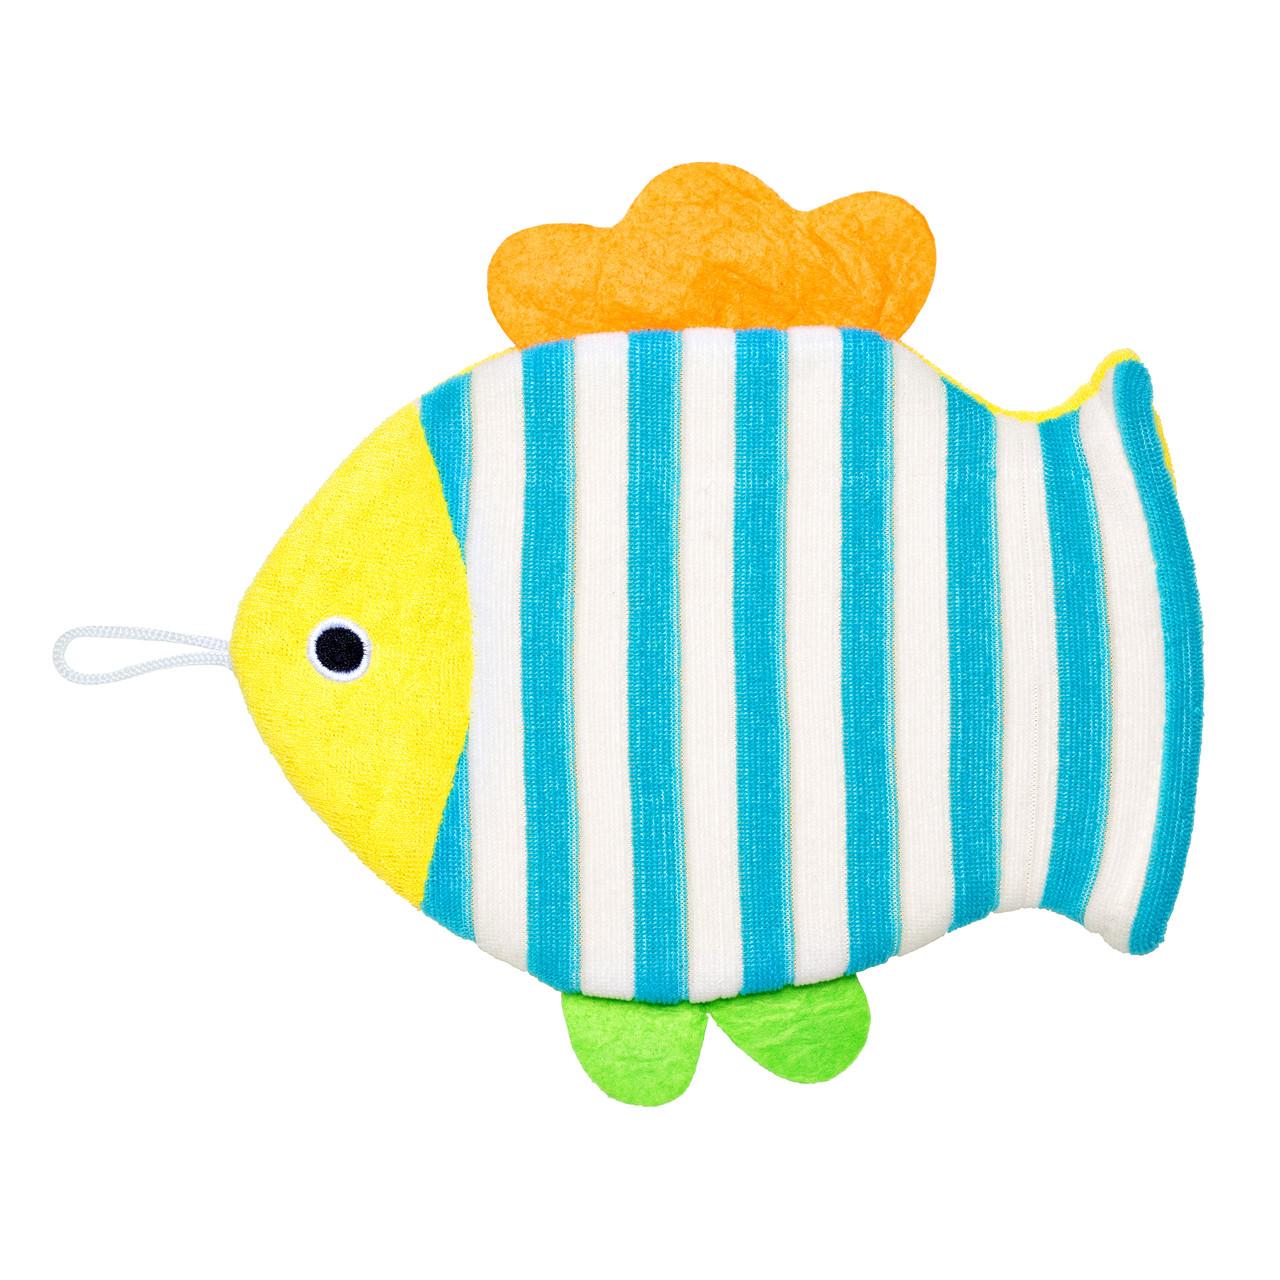 Махровая мочалка-рукавичка «Рыбка» - фото 3